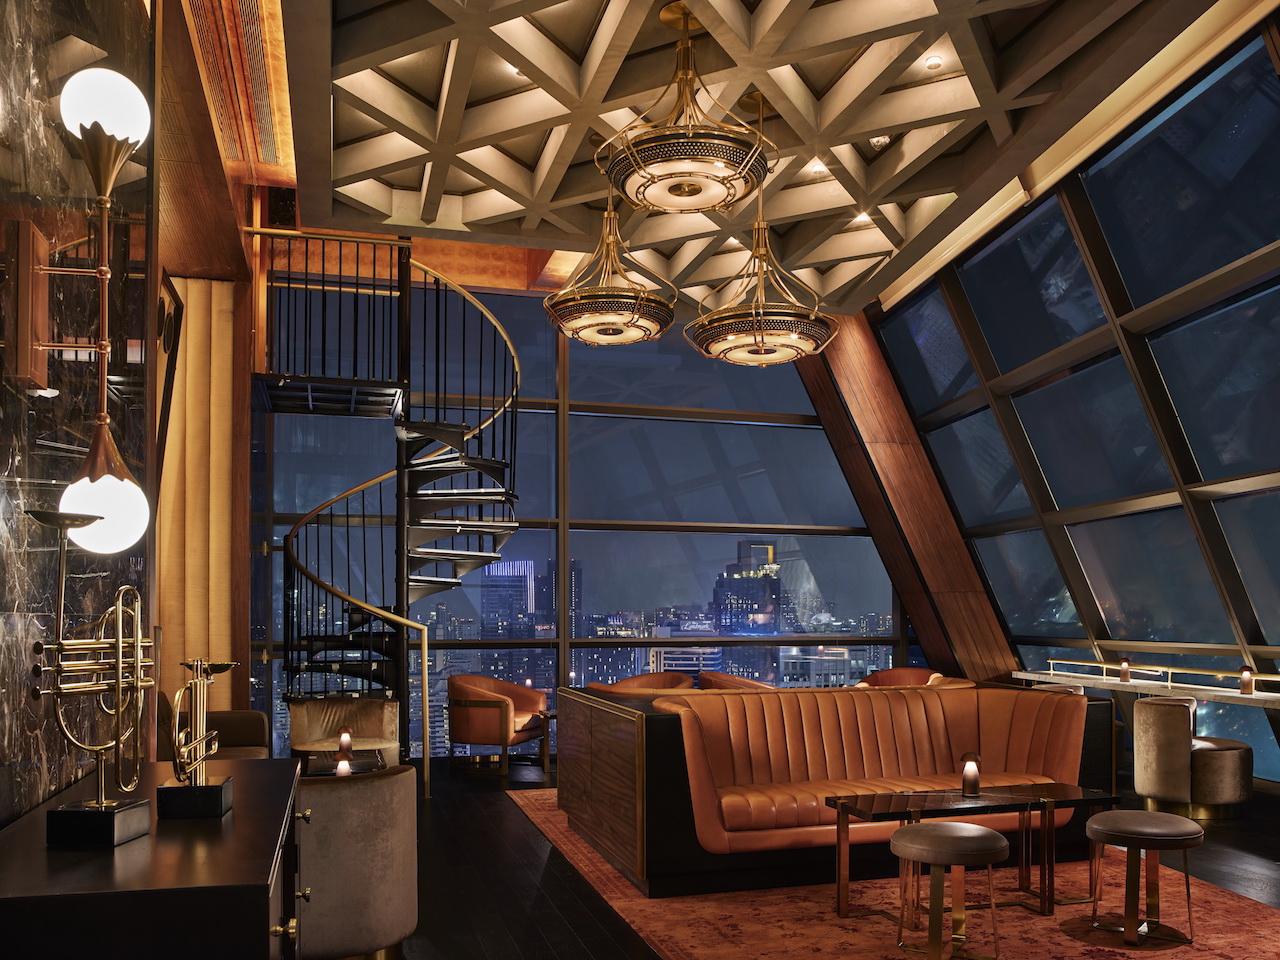 Avroko Design Studio's Unique Design Projects avroko Avroko Design Studio's Unique Design Projects RWBKK Lennons East Lounge